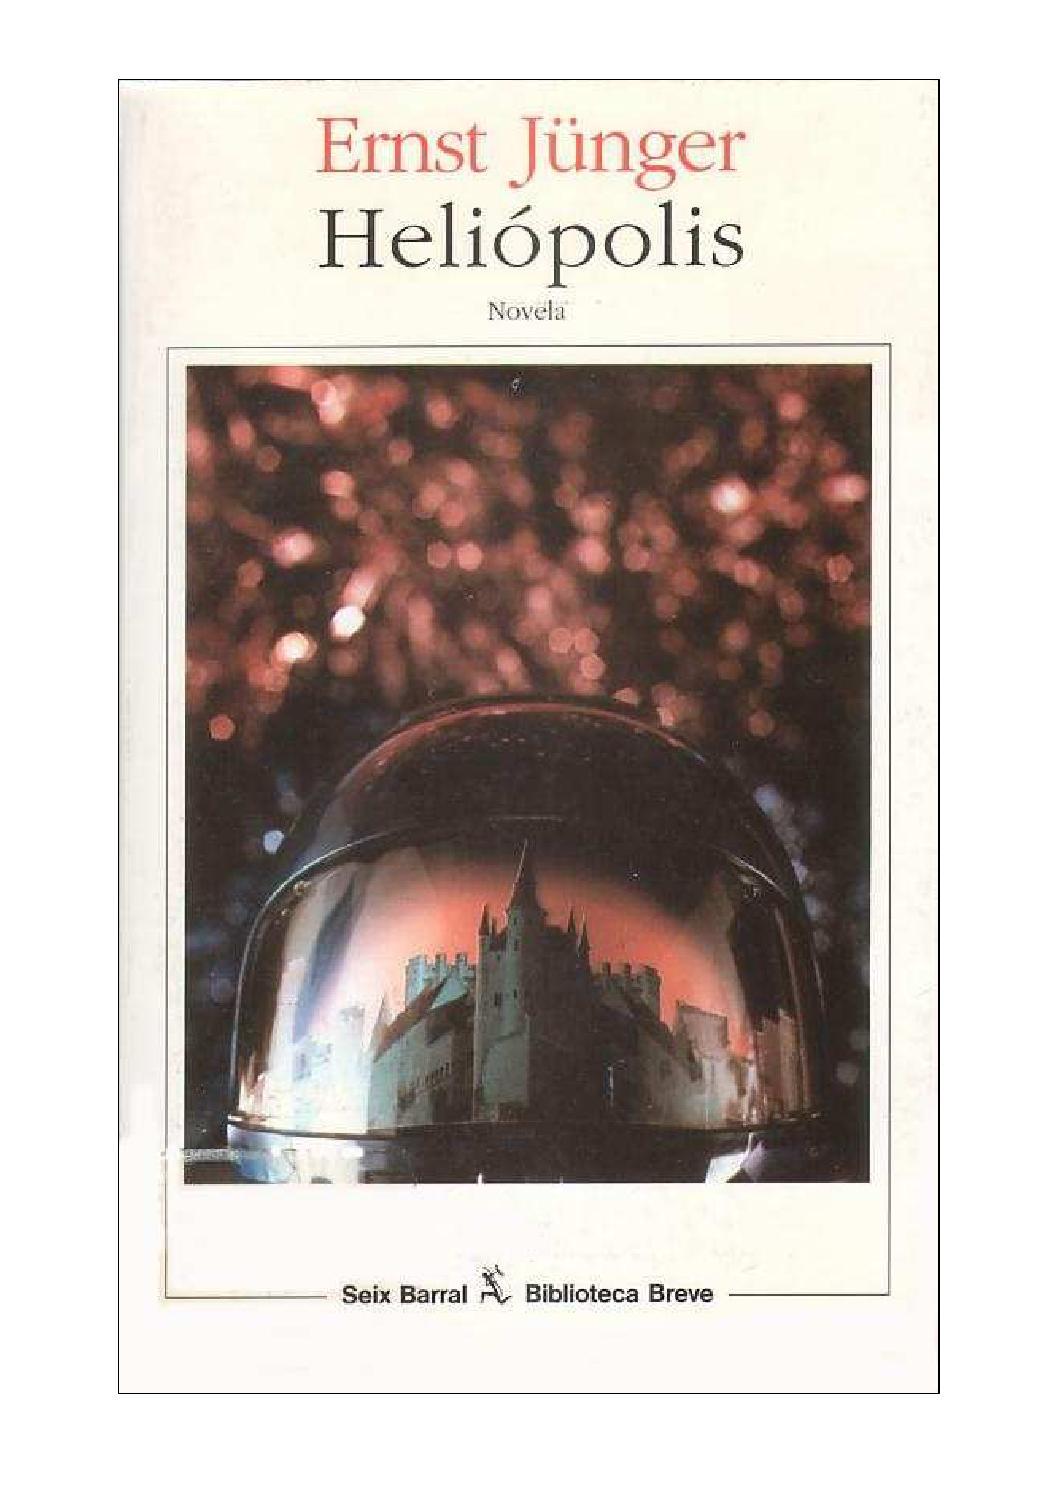 12595384 junger ernst heliopolis by lllllllllllllllllll - issuu